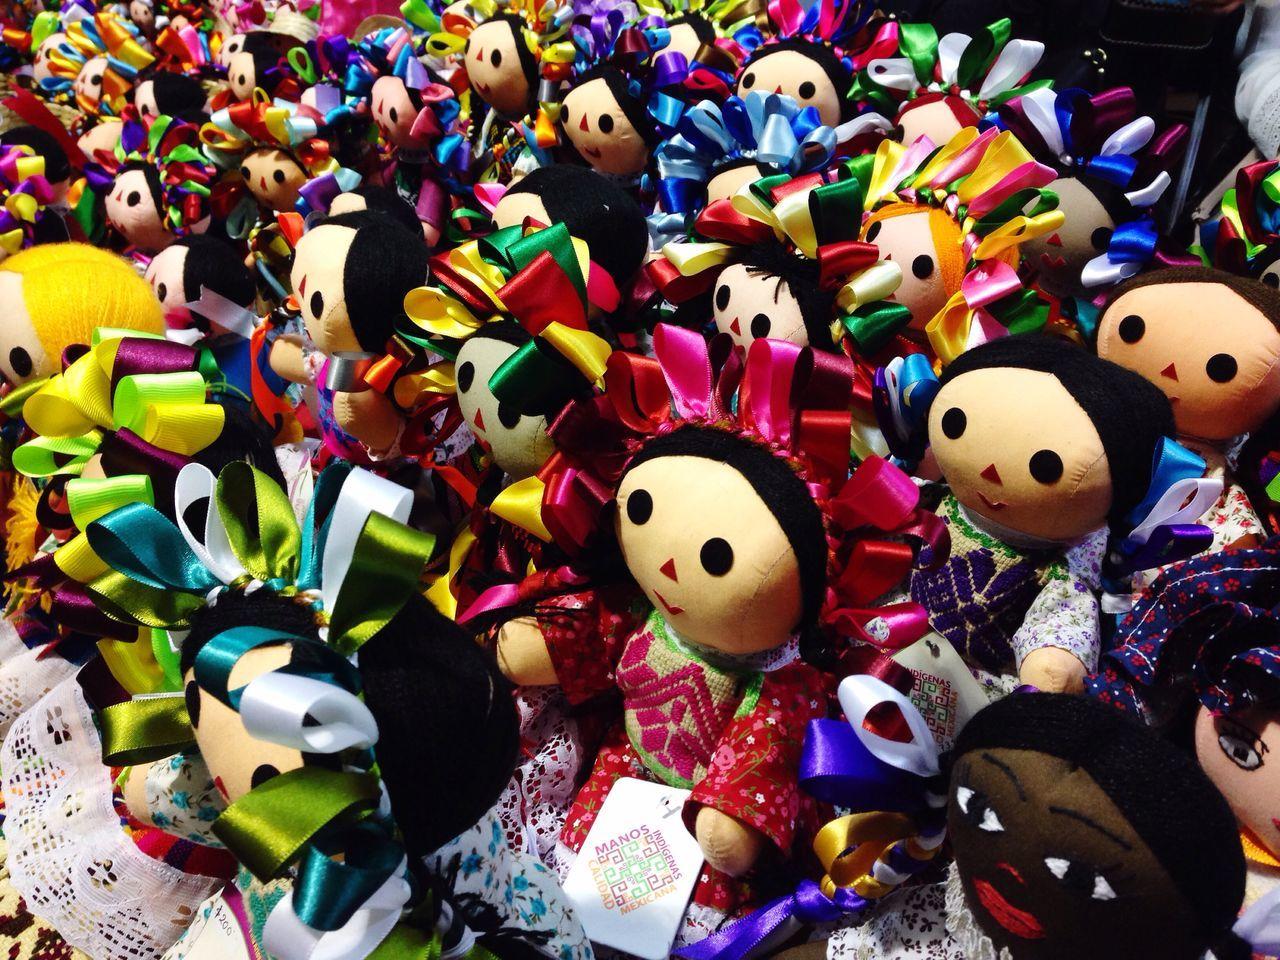 Cdmx2016 Toy Marias